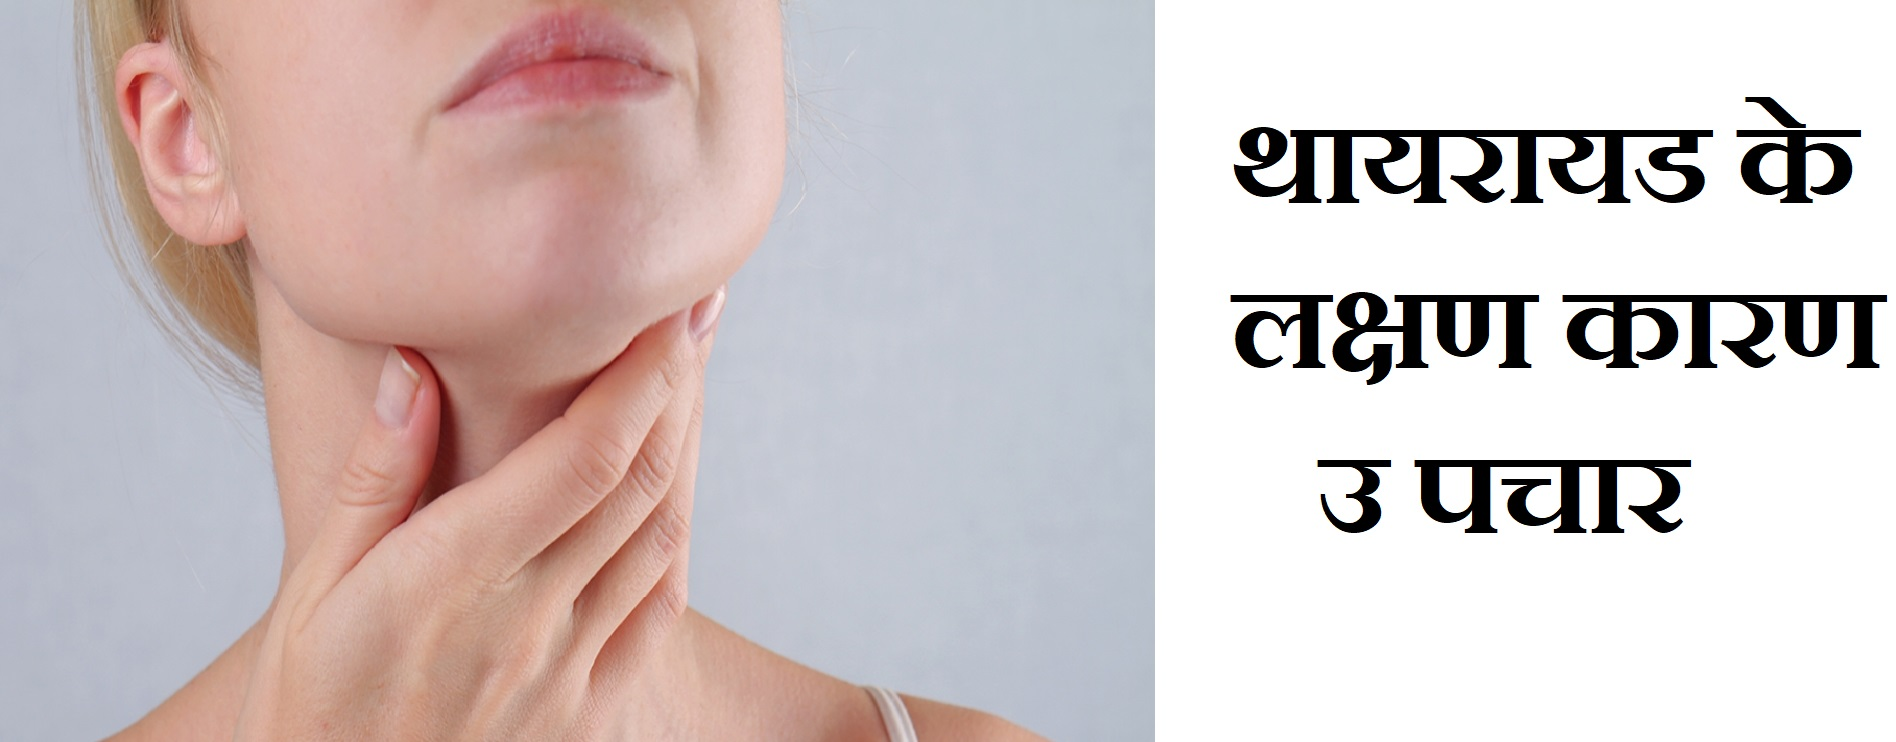 थायरायड के लक्षण, कारण एवं उपचार, Thyroid Disease Causes Treatment In Hindi, Nayichetana.com,Thyroid kaise kare door, thayrayad, thyriad hindi me